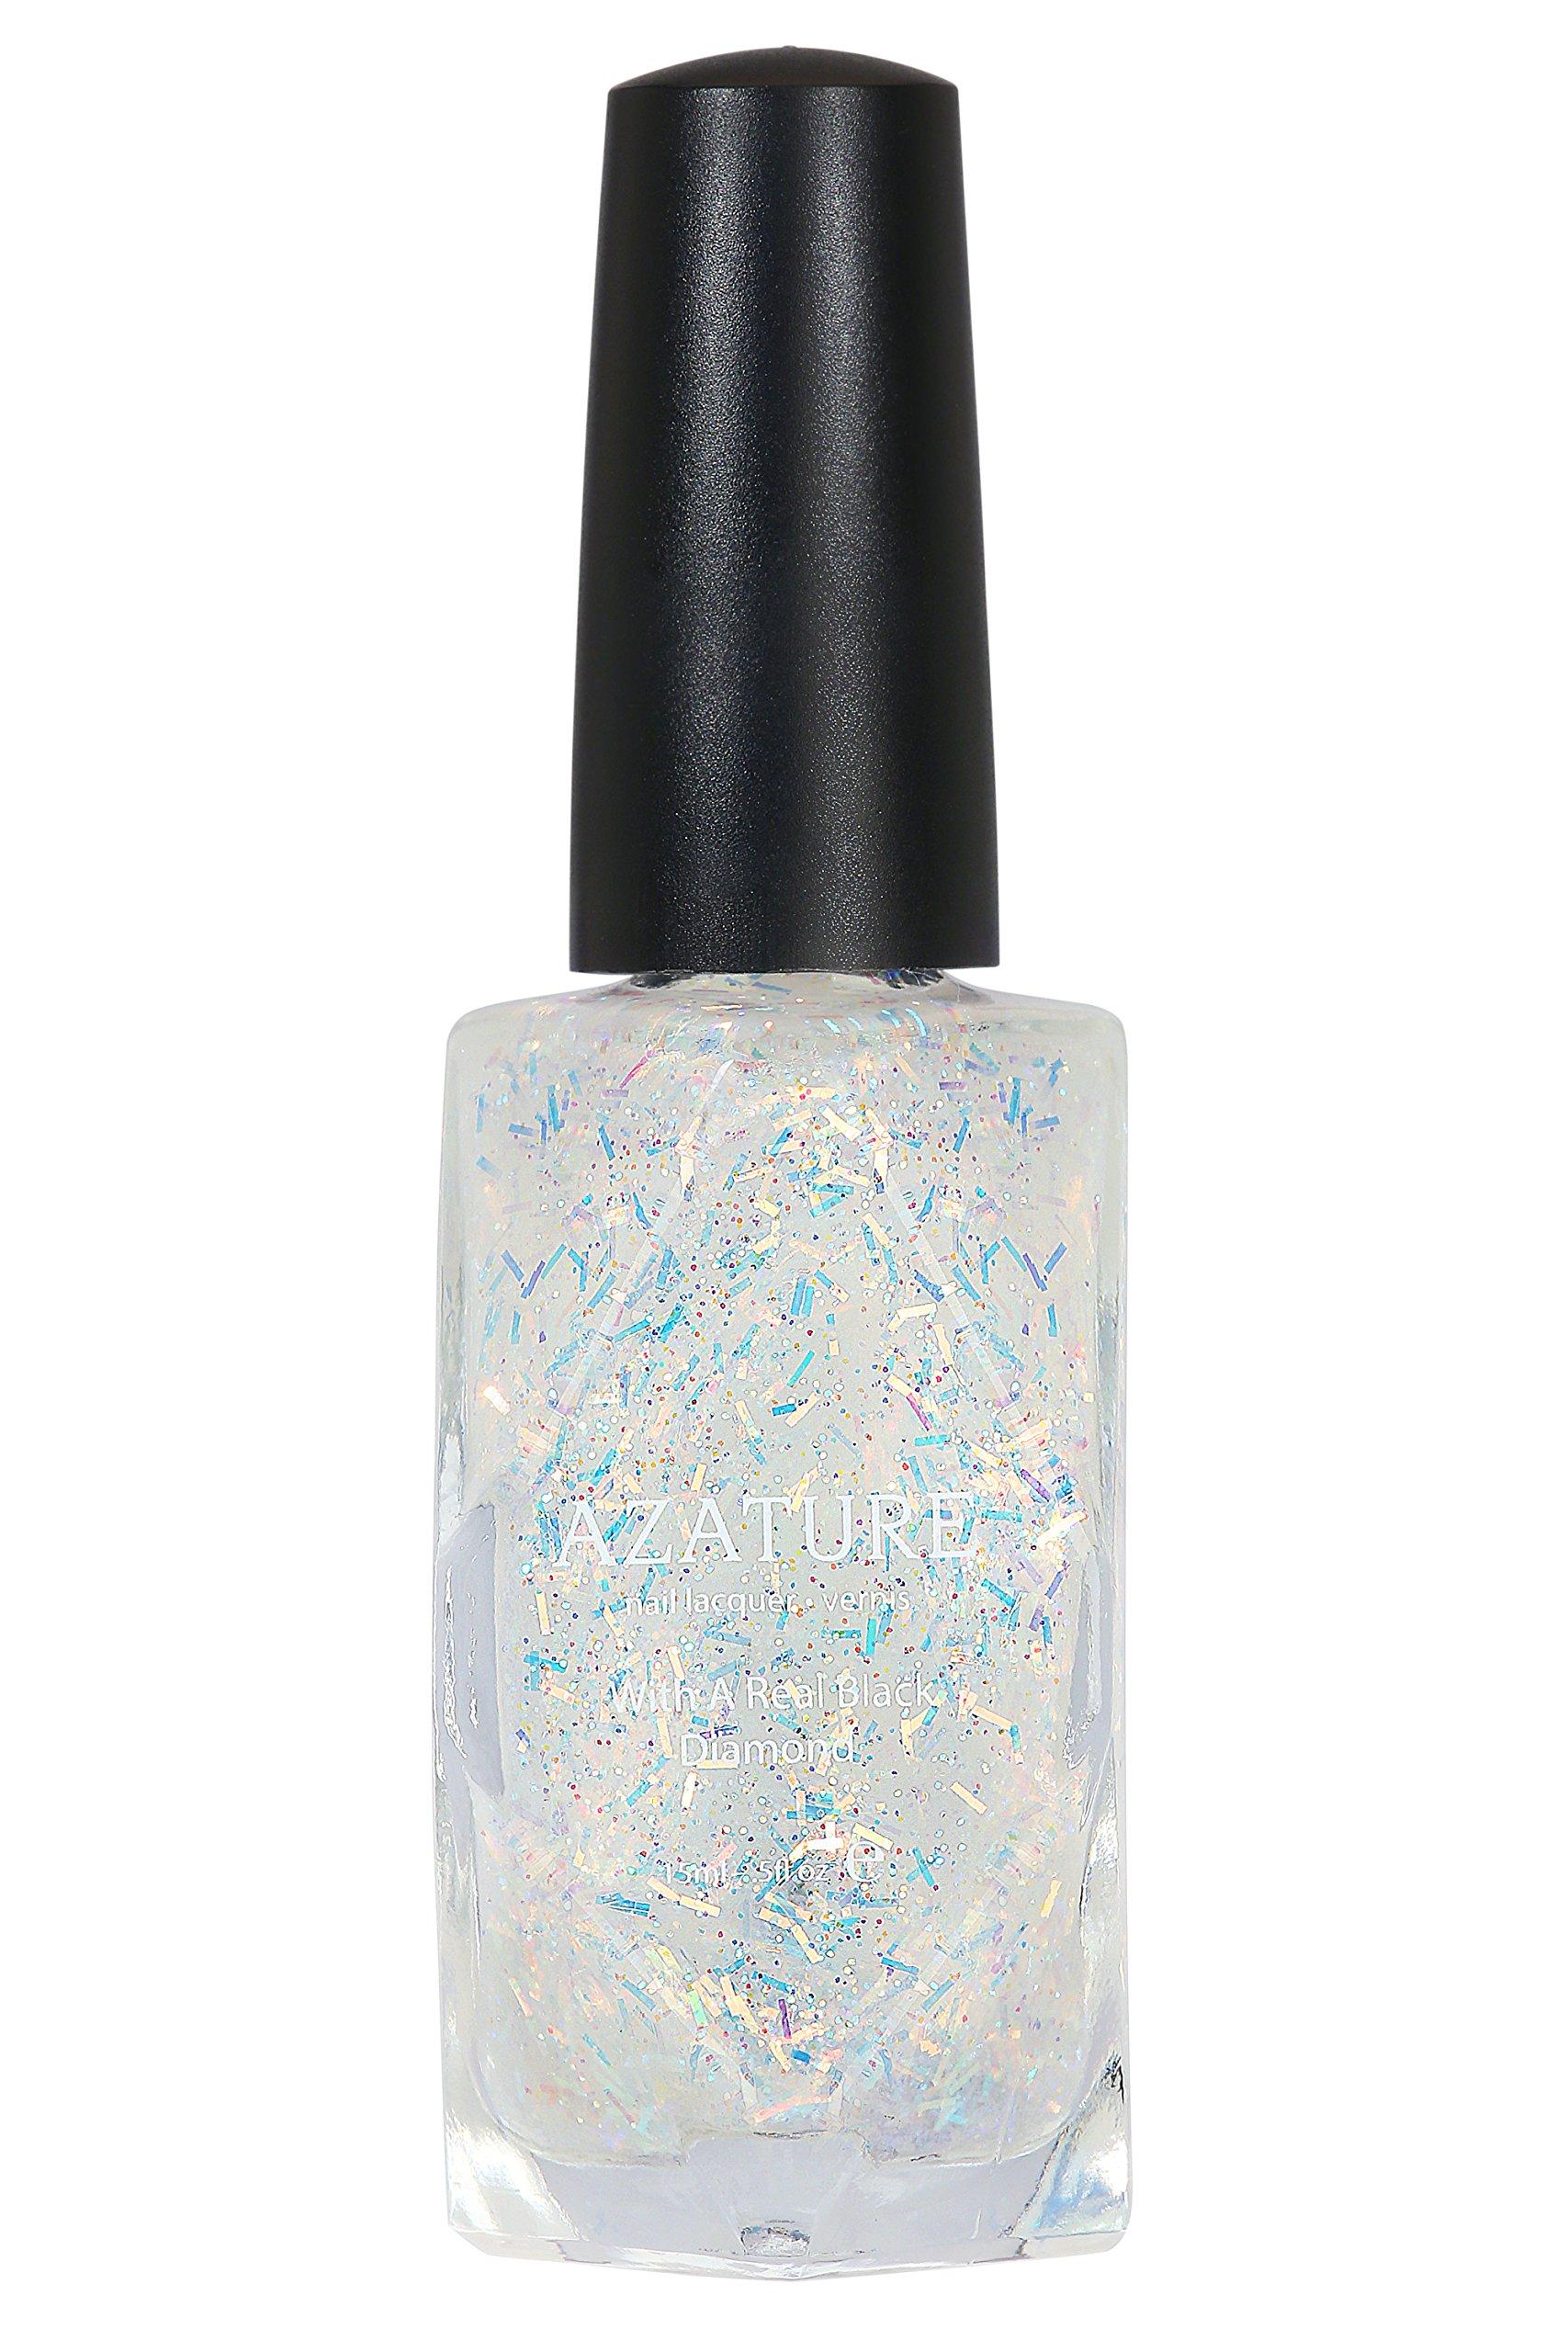 Amazon.com : AZATURE Black Diamond Nail Lacquer, Pink, 0.5 Fluid ...